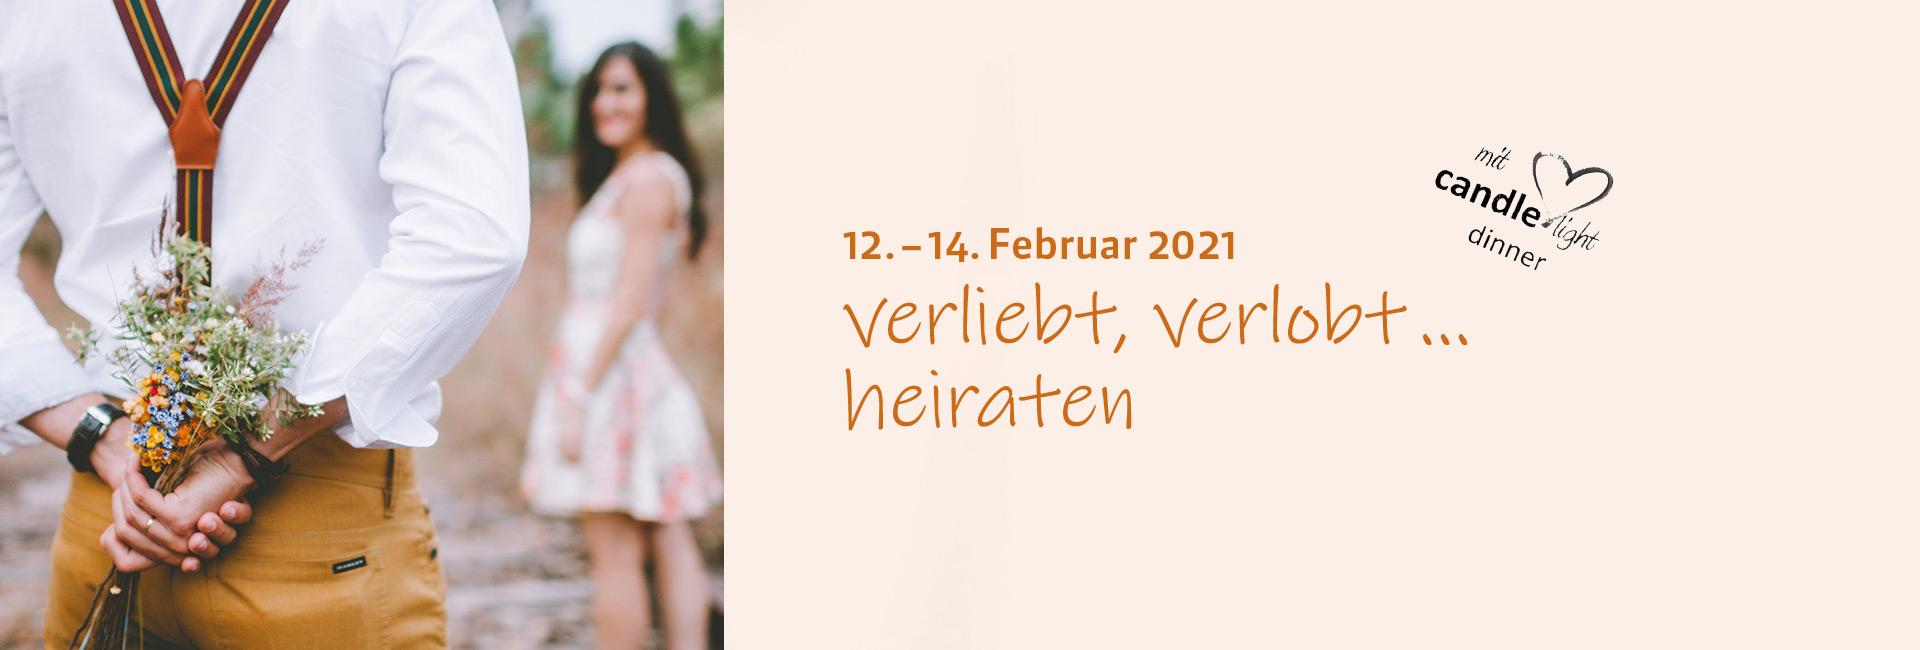 slider sfh verliebt verlobt 2021